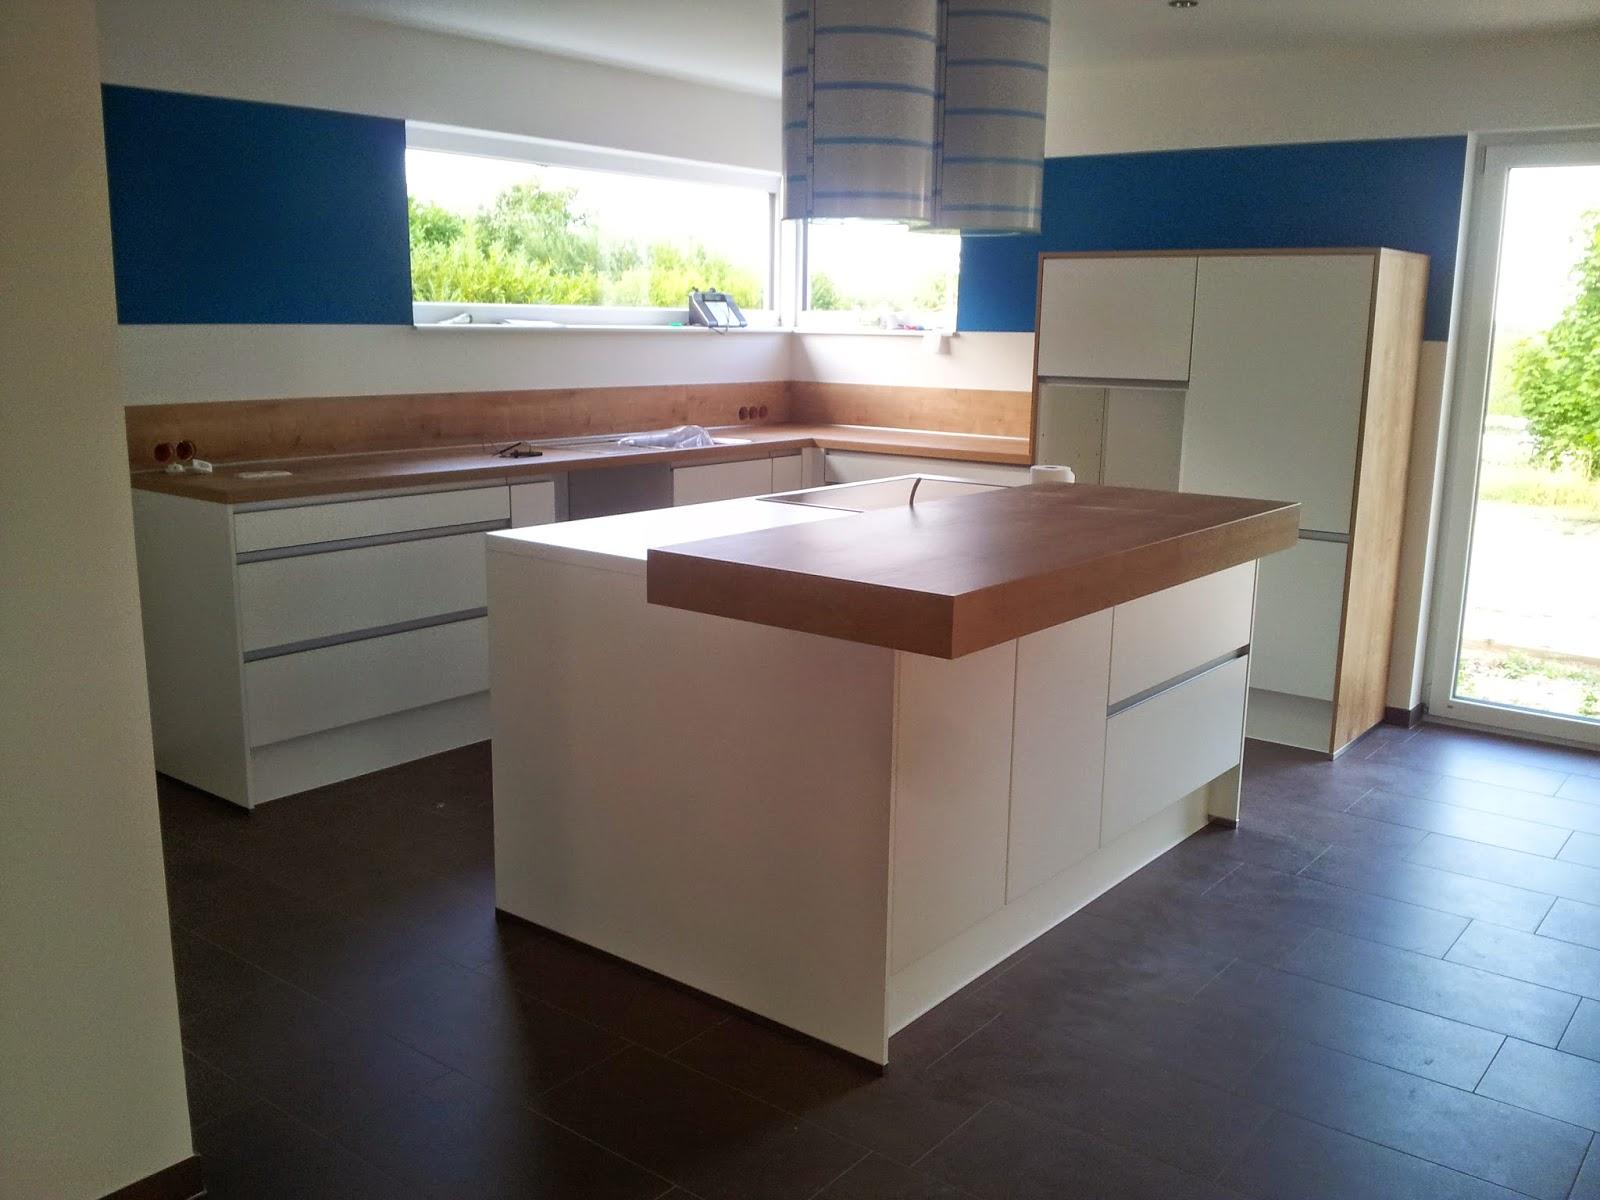 Side By Side Kühlschrank Küche : Homesweethome die küche kommt